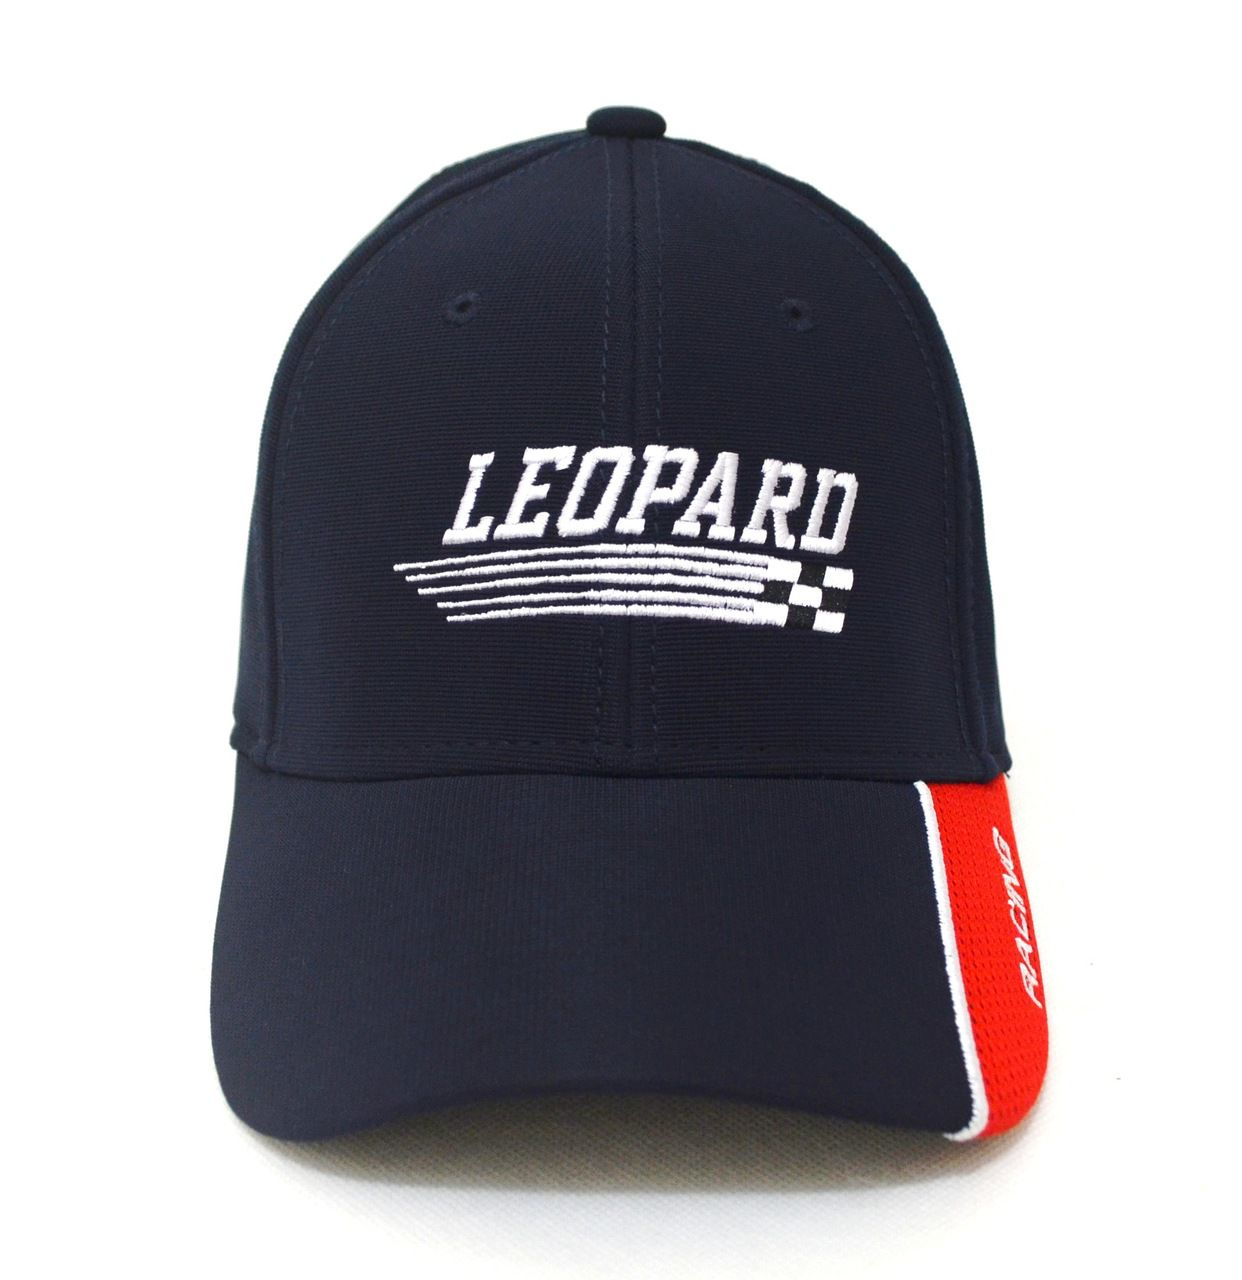 Boné Racing Leopard Aba Curva Super Leve - Carros e Motos